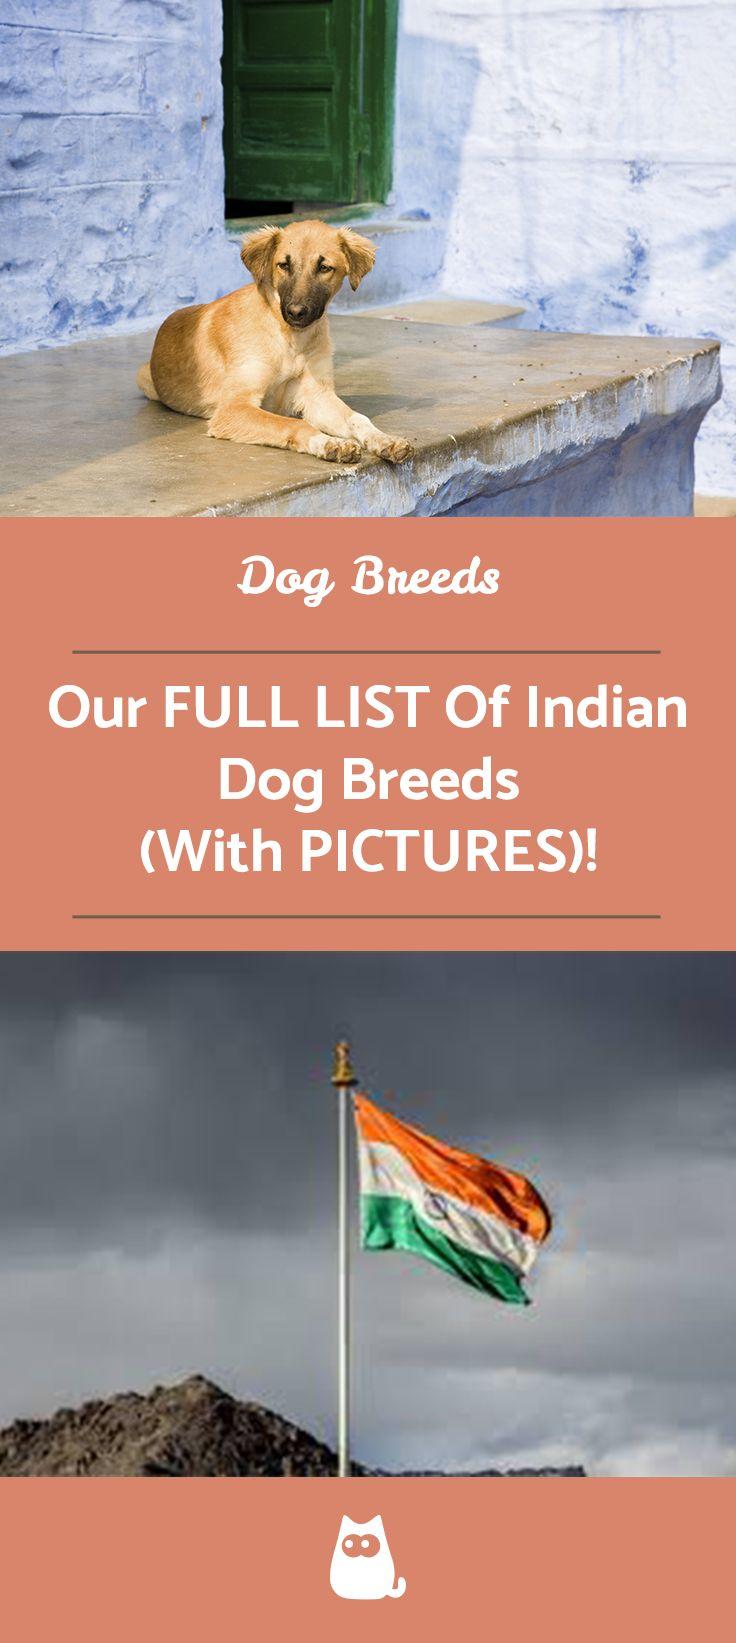 Indian Breeds Of Dog List With Pictures Dog Breeds List Dog List Breeds